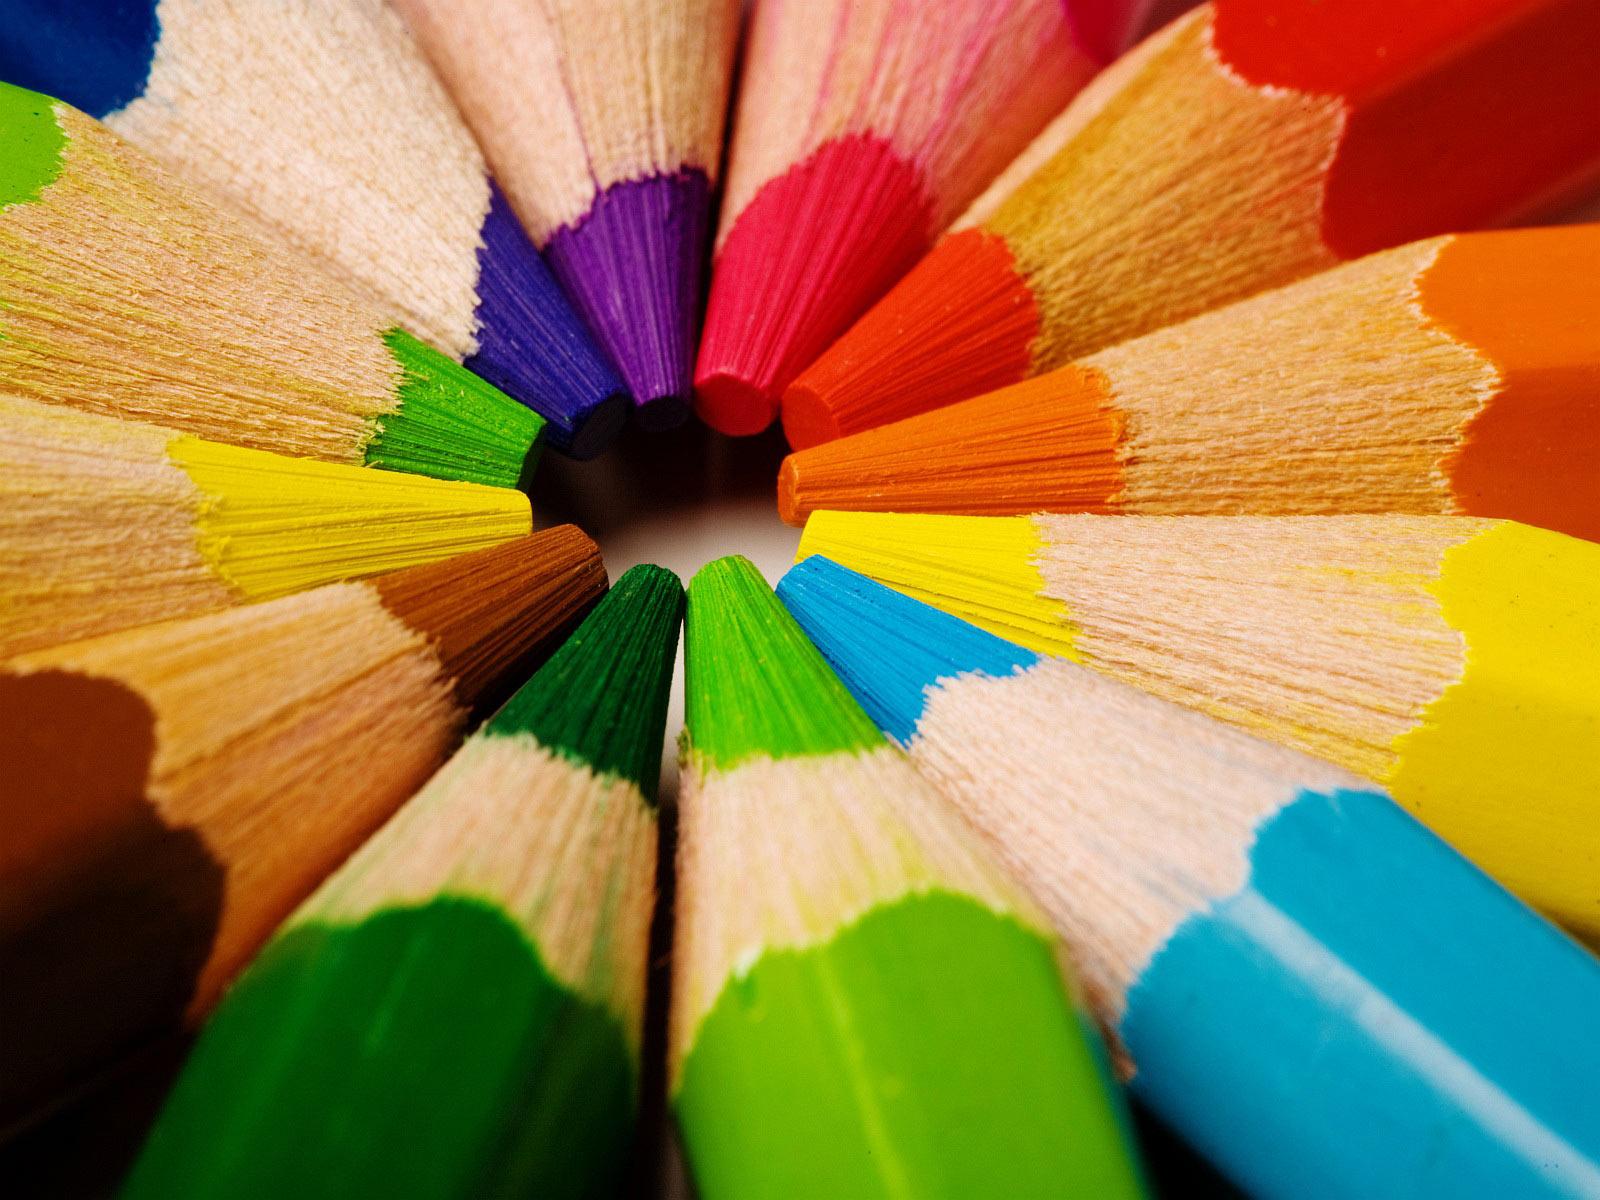 http://1.bp.blogspot.com/-pg0Mz6RXqno/ToGWCy05UmI/AAAAAAAAAXc/lvxrCWpRTzo/s1600/Color%2Bwallpaper%2BPencils.jpg